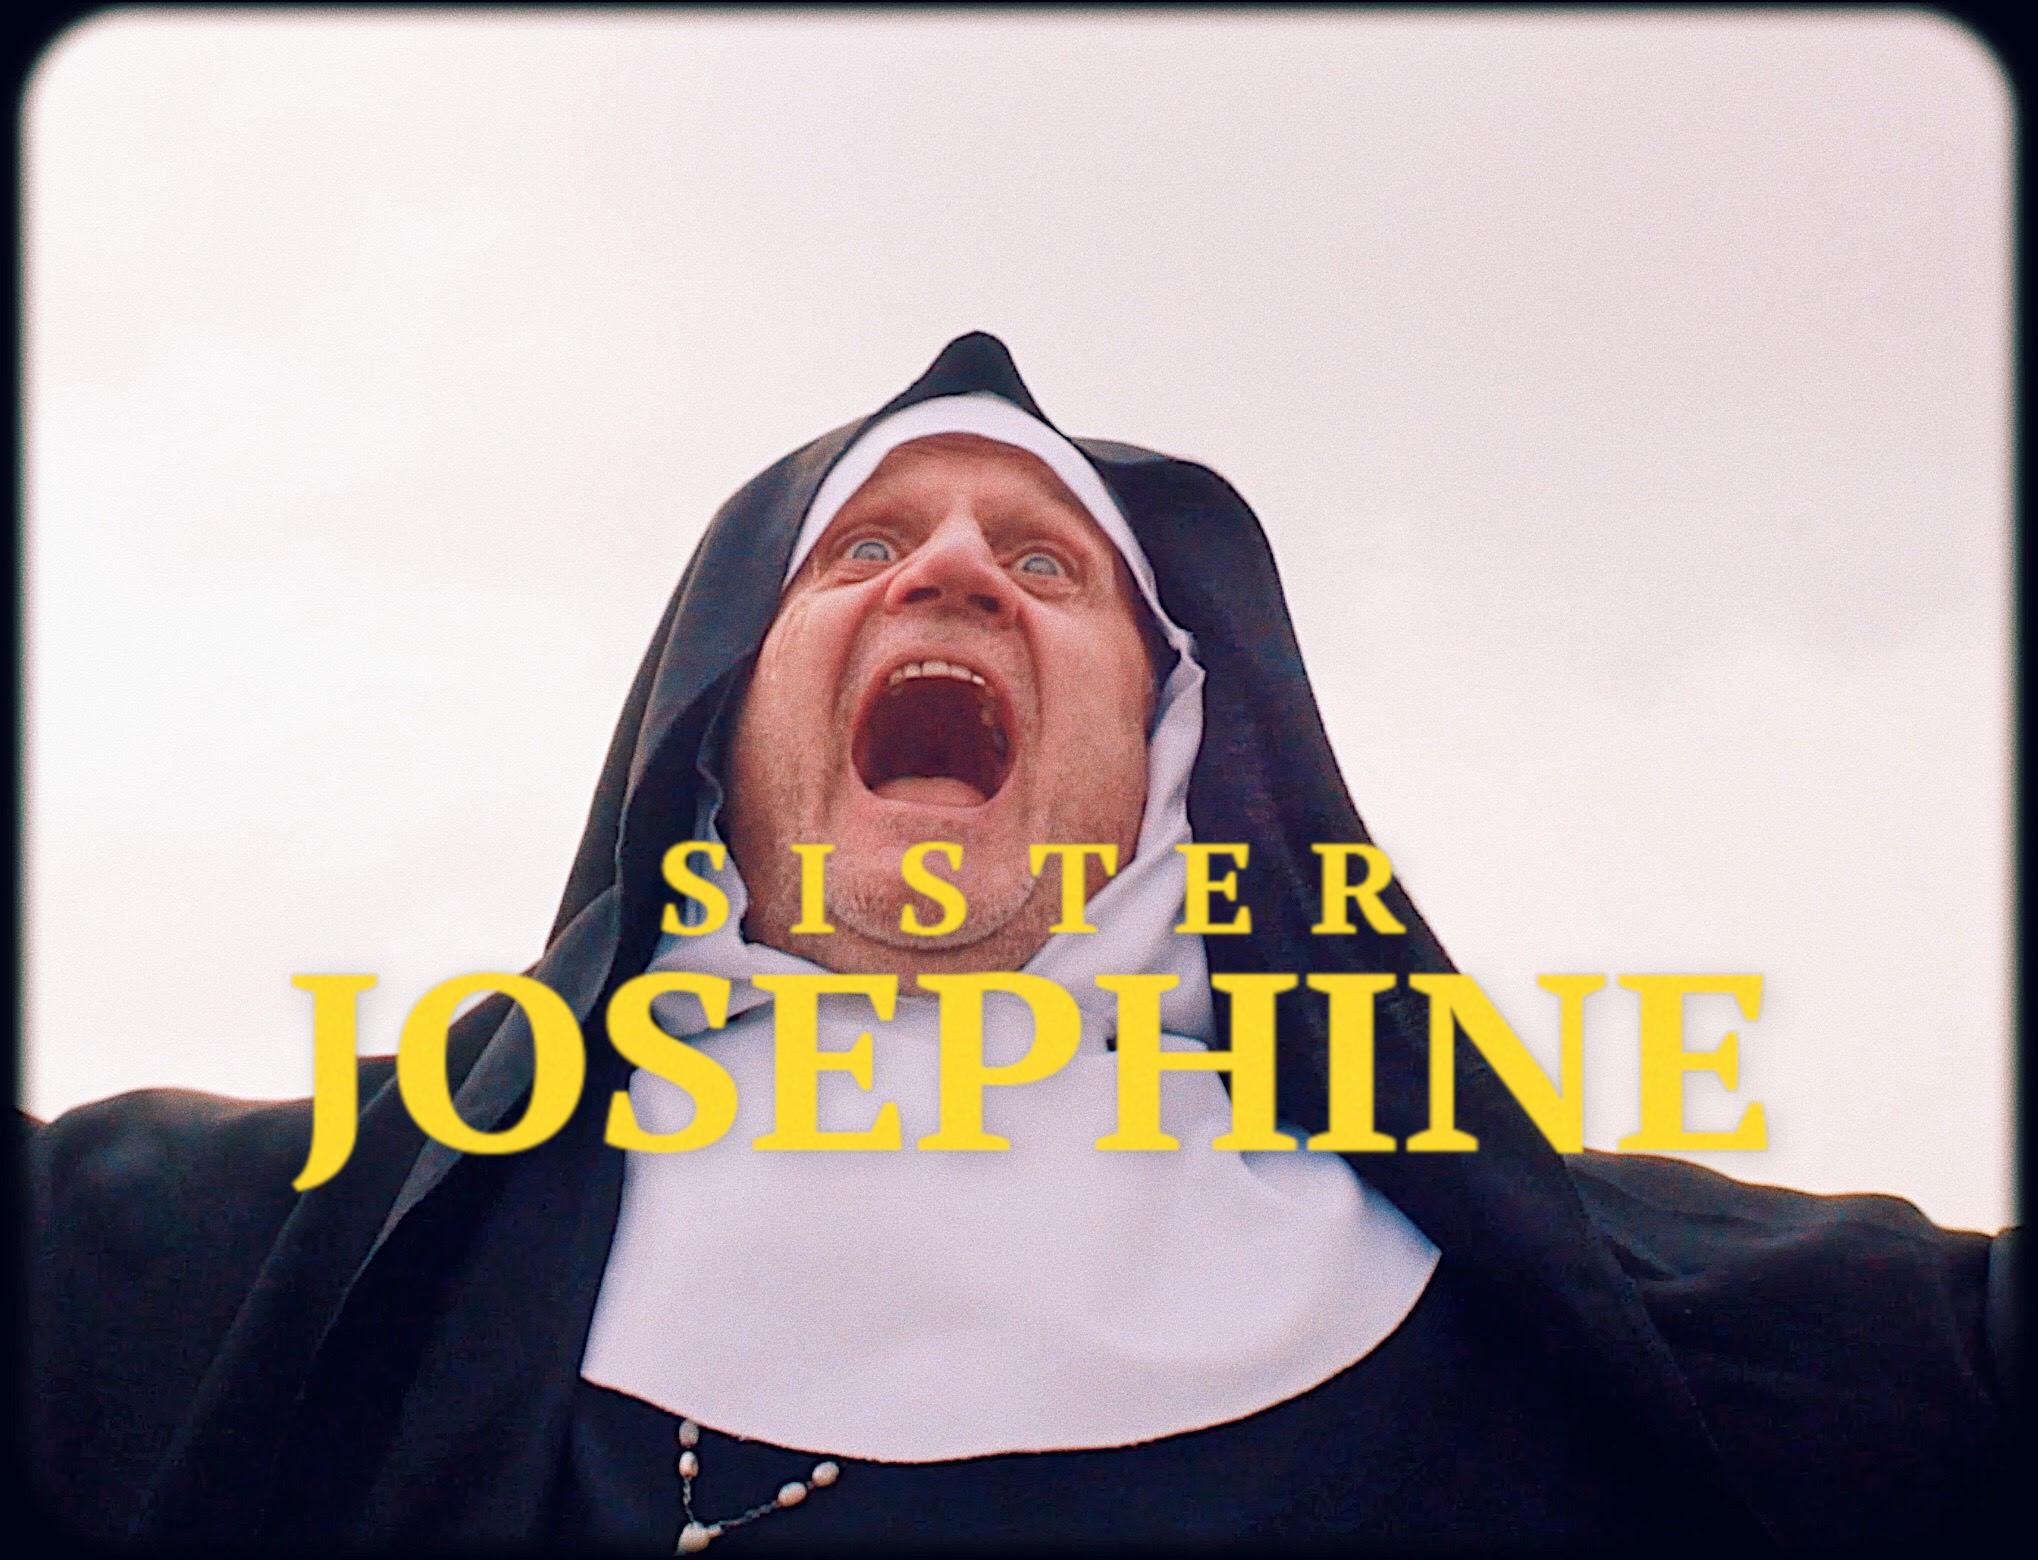 'Sister Josephine' - Jake Thackray